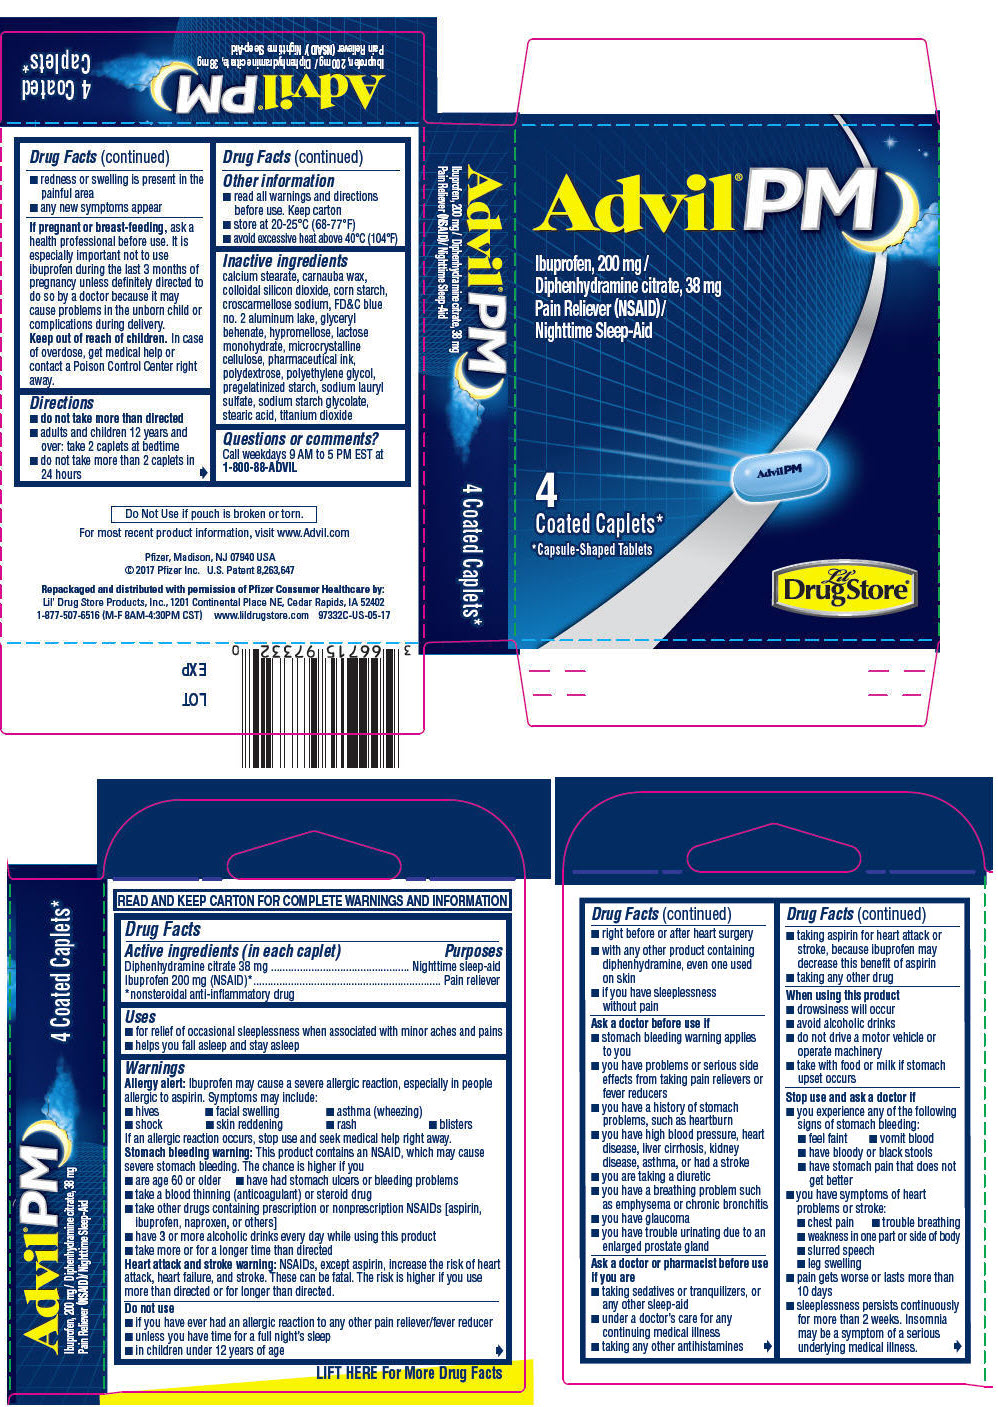 PRINCIPAL DISPLAY PANEL - 4 Coated Caplets Carton